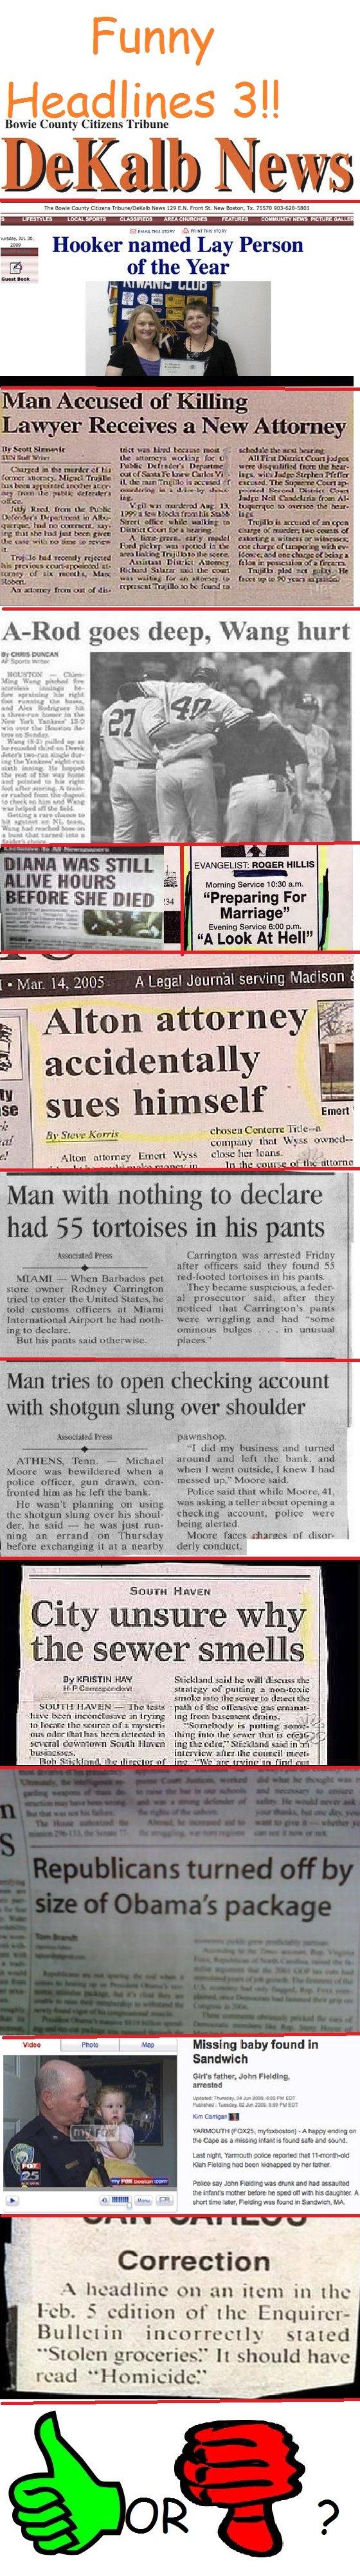 Funny Headlines 3. Original: www.funnyjunk.com/funny_pictures/960243/Funny+Headlines/<br /> Part 2:<br /> www.funnyjunk.com/funny_pictures/961339/Fu